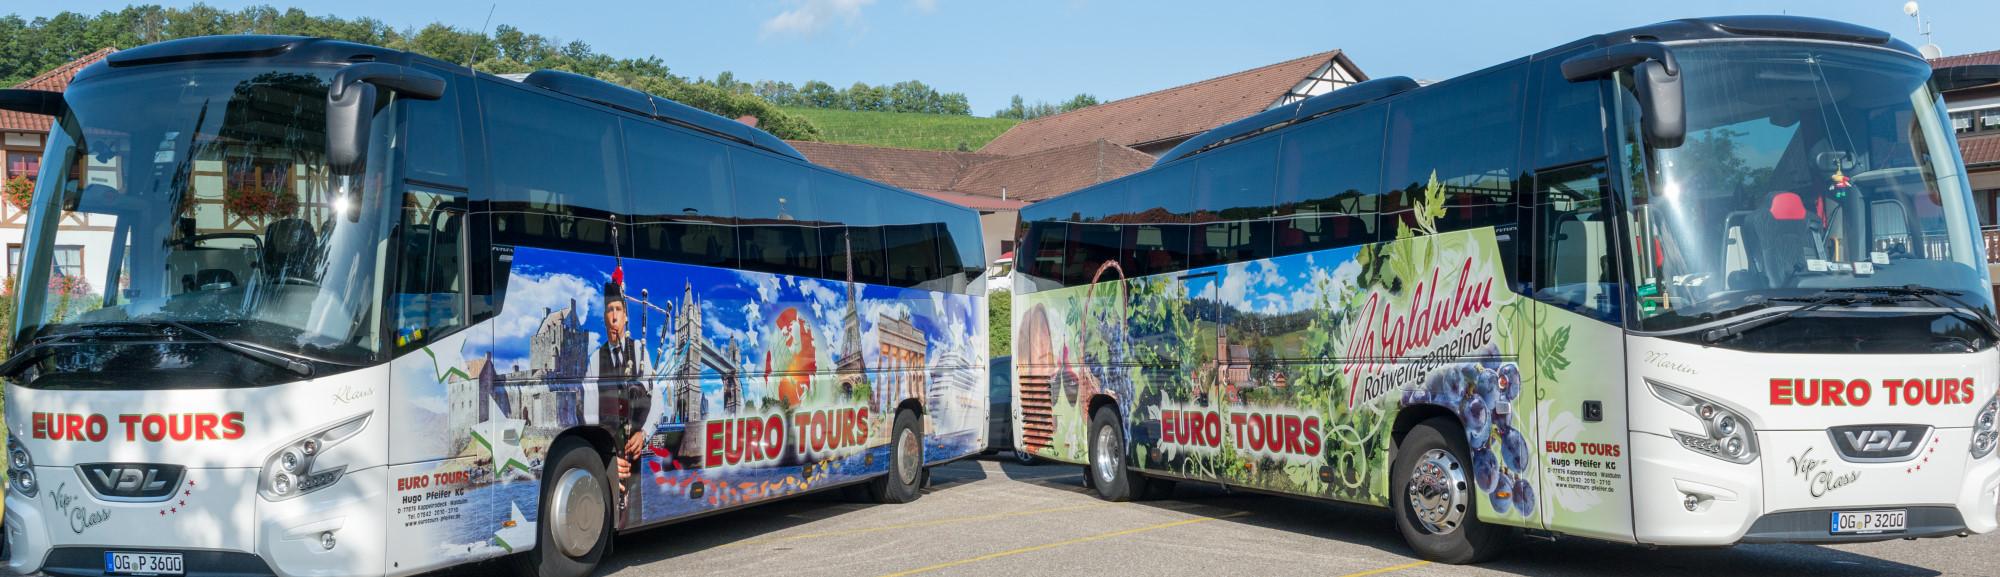 Modernste Reisebusse